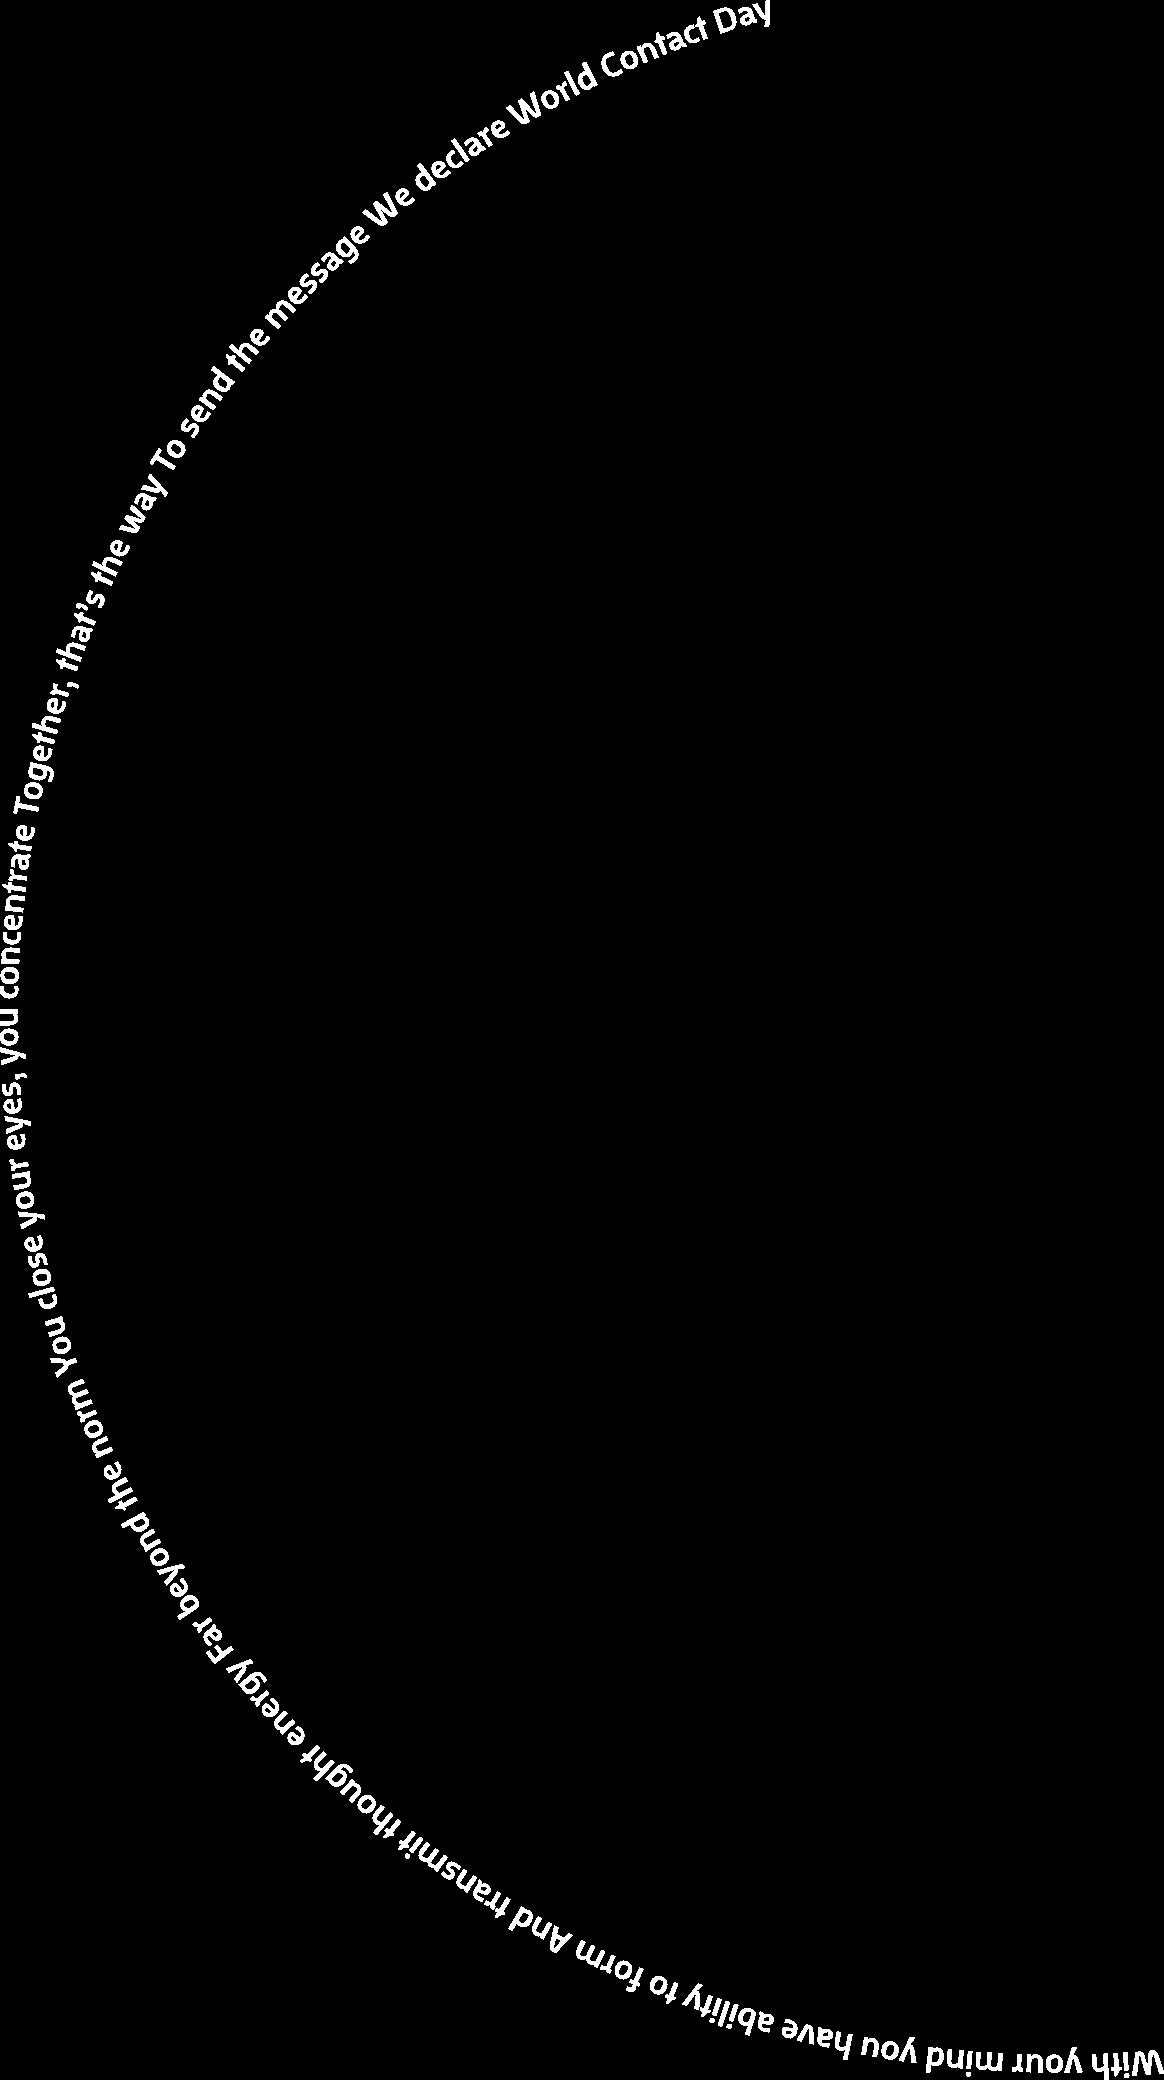 Image-Interstella-9